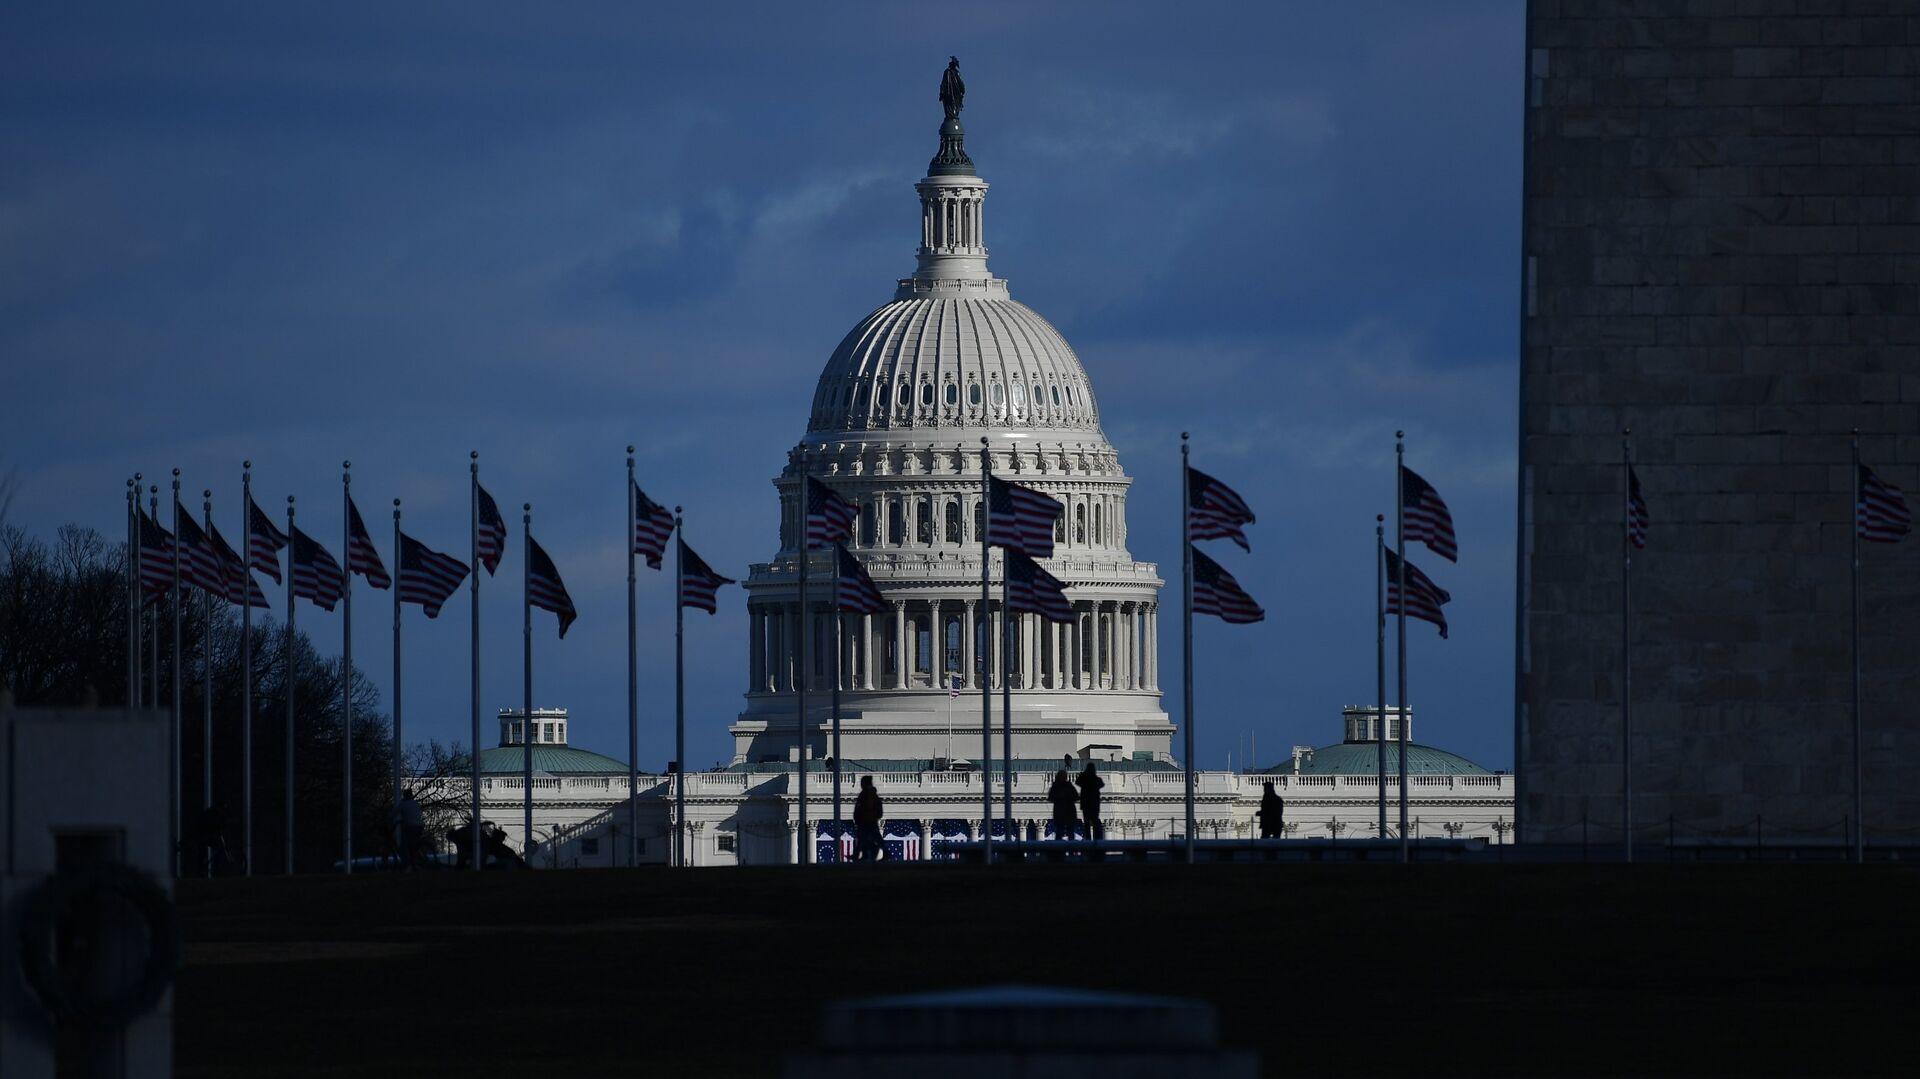 Вид на Капитолий в Вашингтоне - РИА Новости, 1920, 29.04.2021